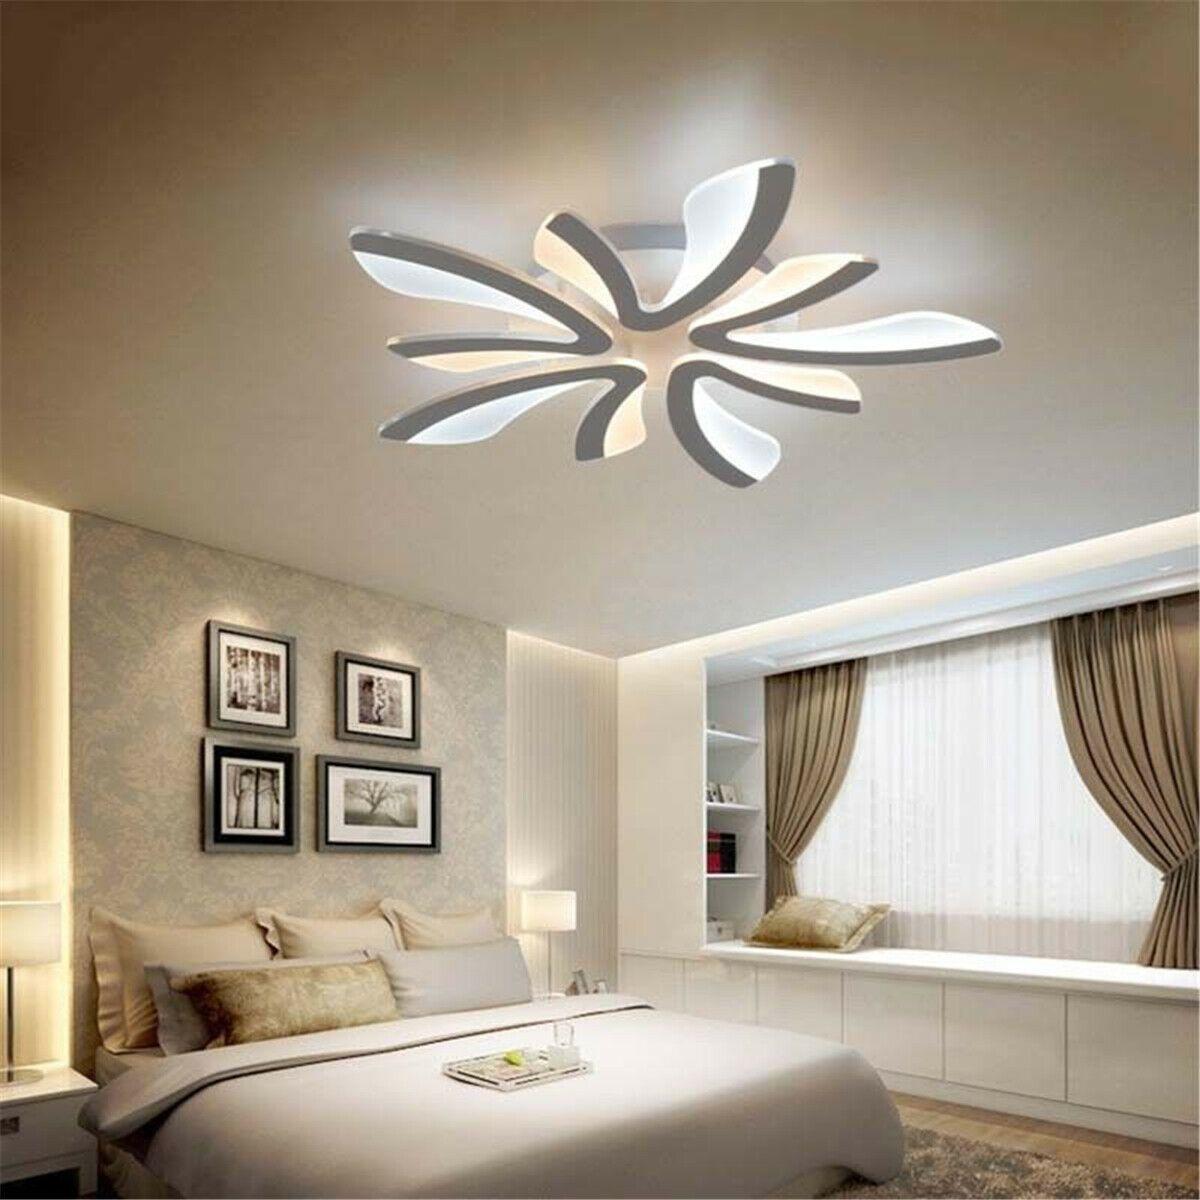 Modern Led Dandelion Acrylic Ceiling Lamp Pendant Light Chandeliers Bedroom Room Home Decor Id Chandelier In Living Room Ceiling Lights Ceiling Pendant Lights